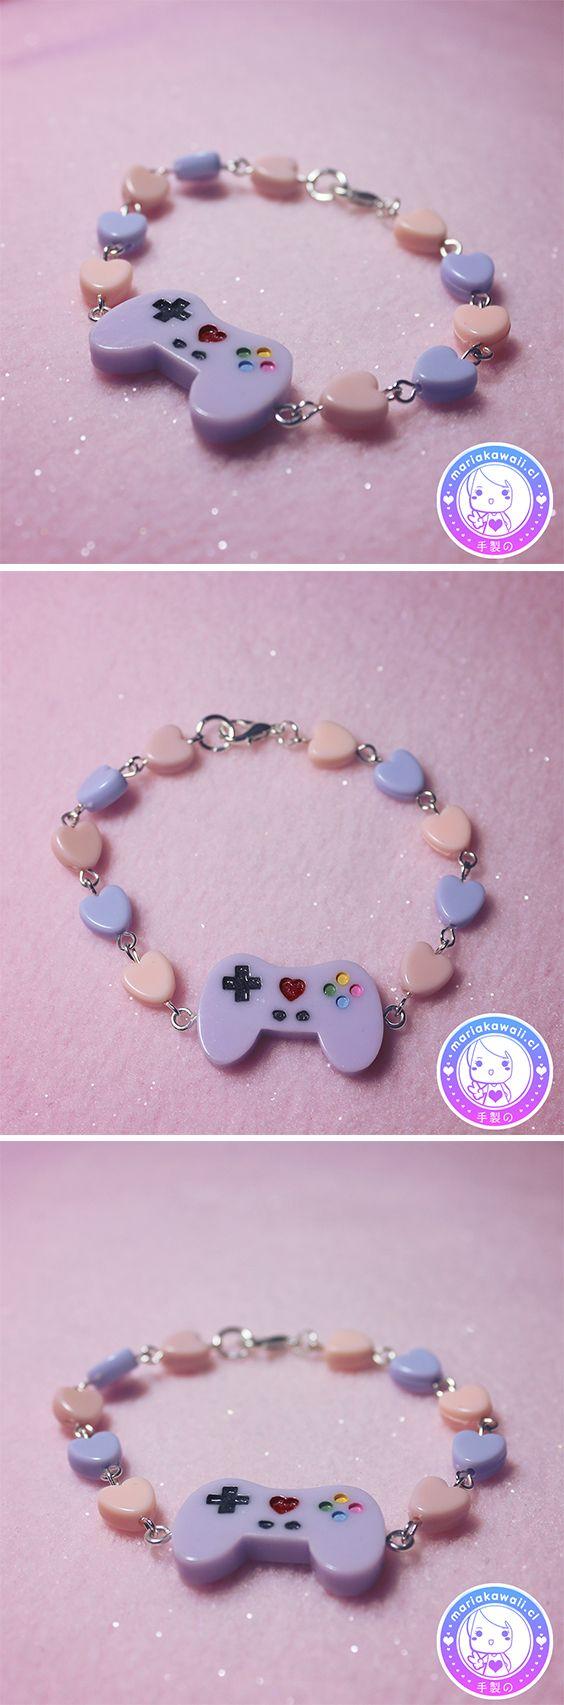 María Kawaii Store ♥ Gamer Joystick Bracelet Lila